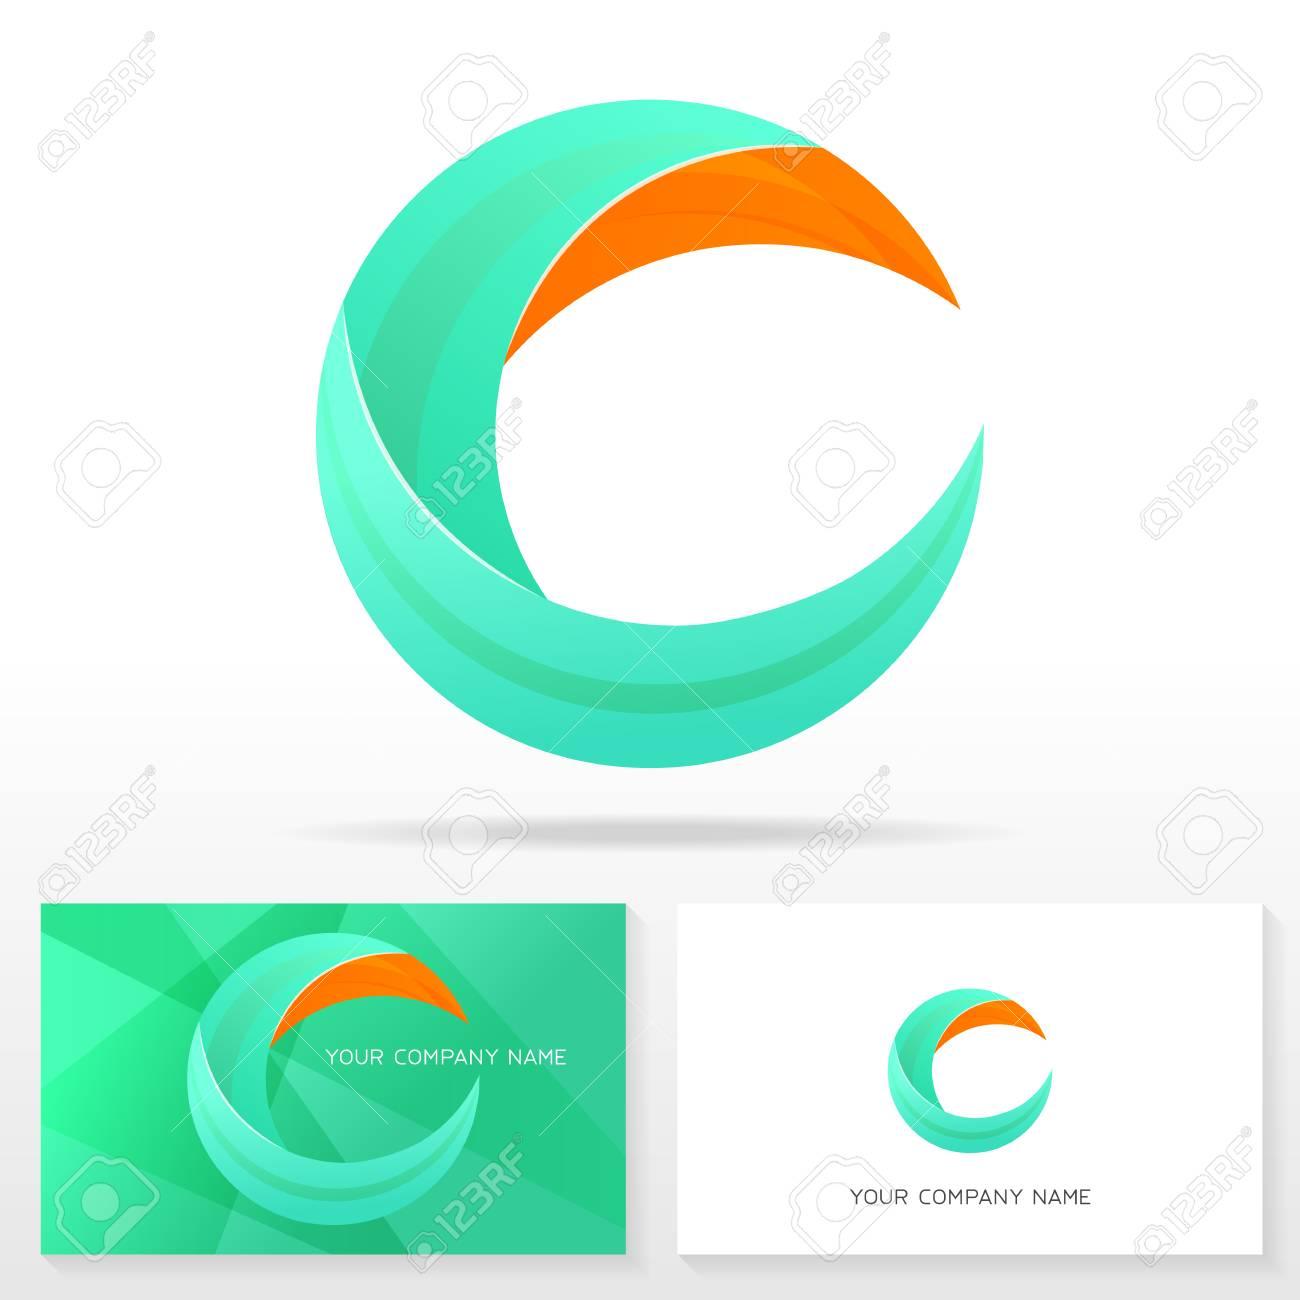 Letter c logo icon design template elements business card templates letter c logo icon design template elements business card templates stock vector 75266242 spiritdancerdesigns Gallery